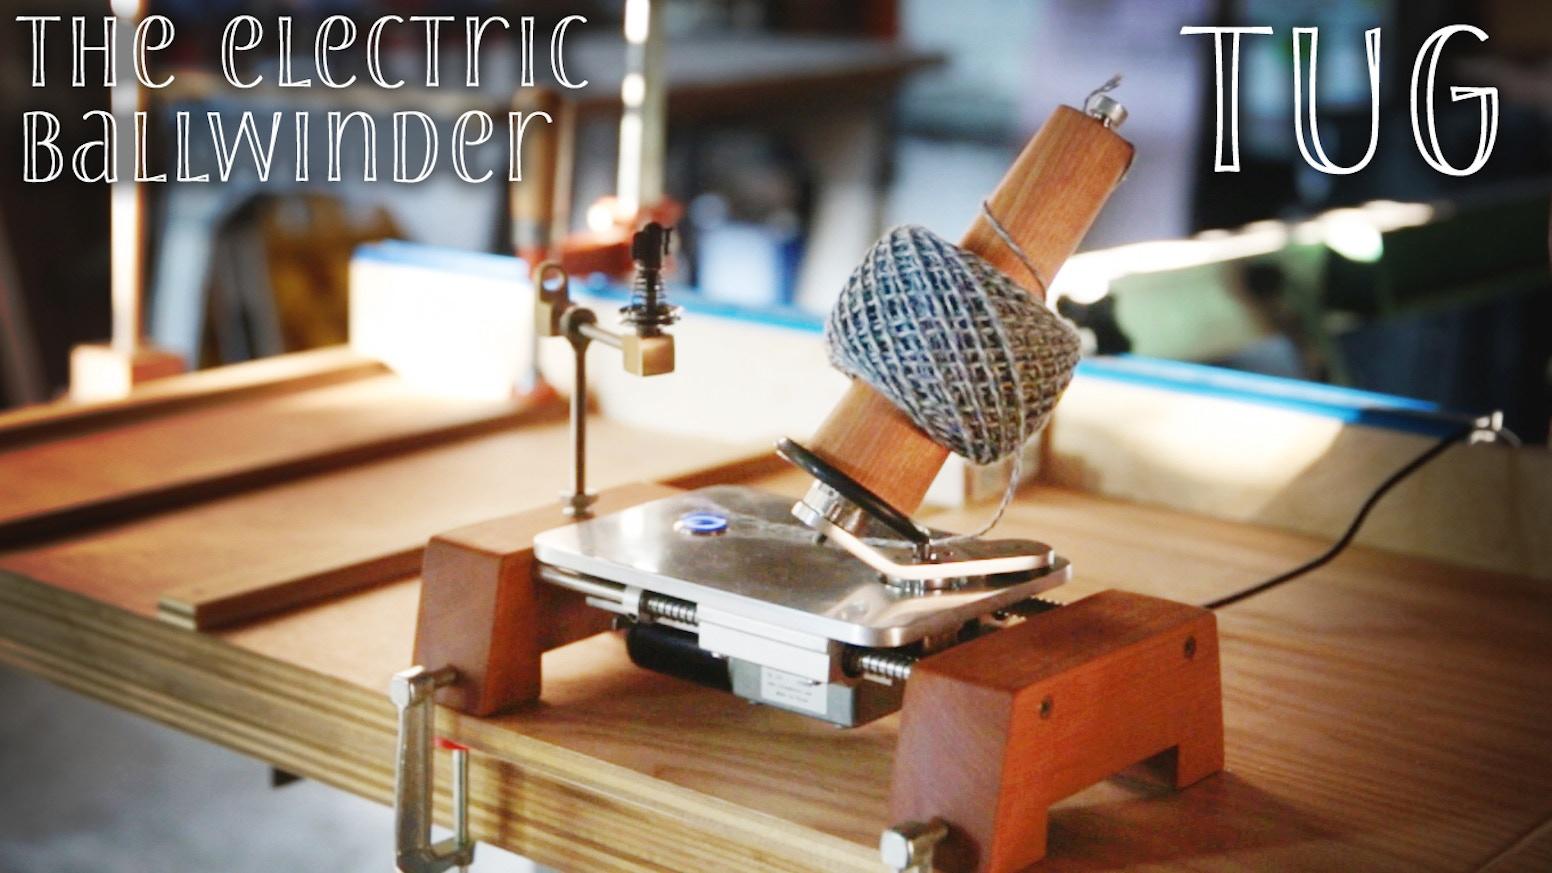 Tug The Electric Ballwinder By Sawyer Bee Kickstarter